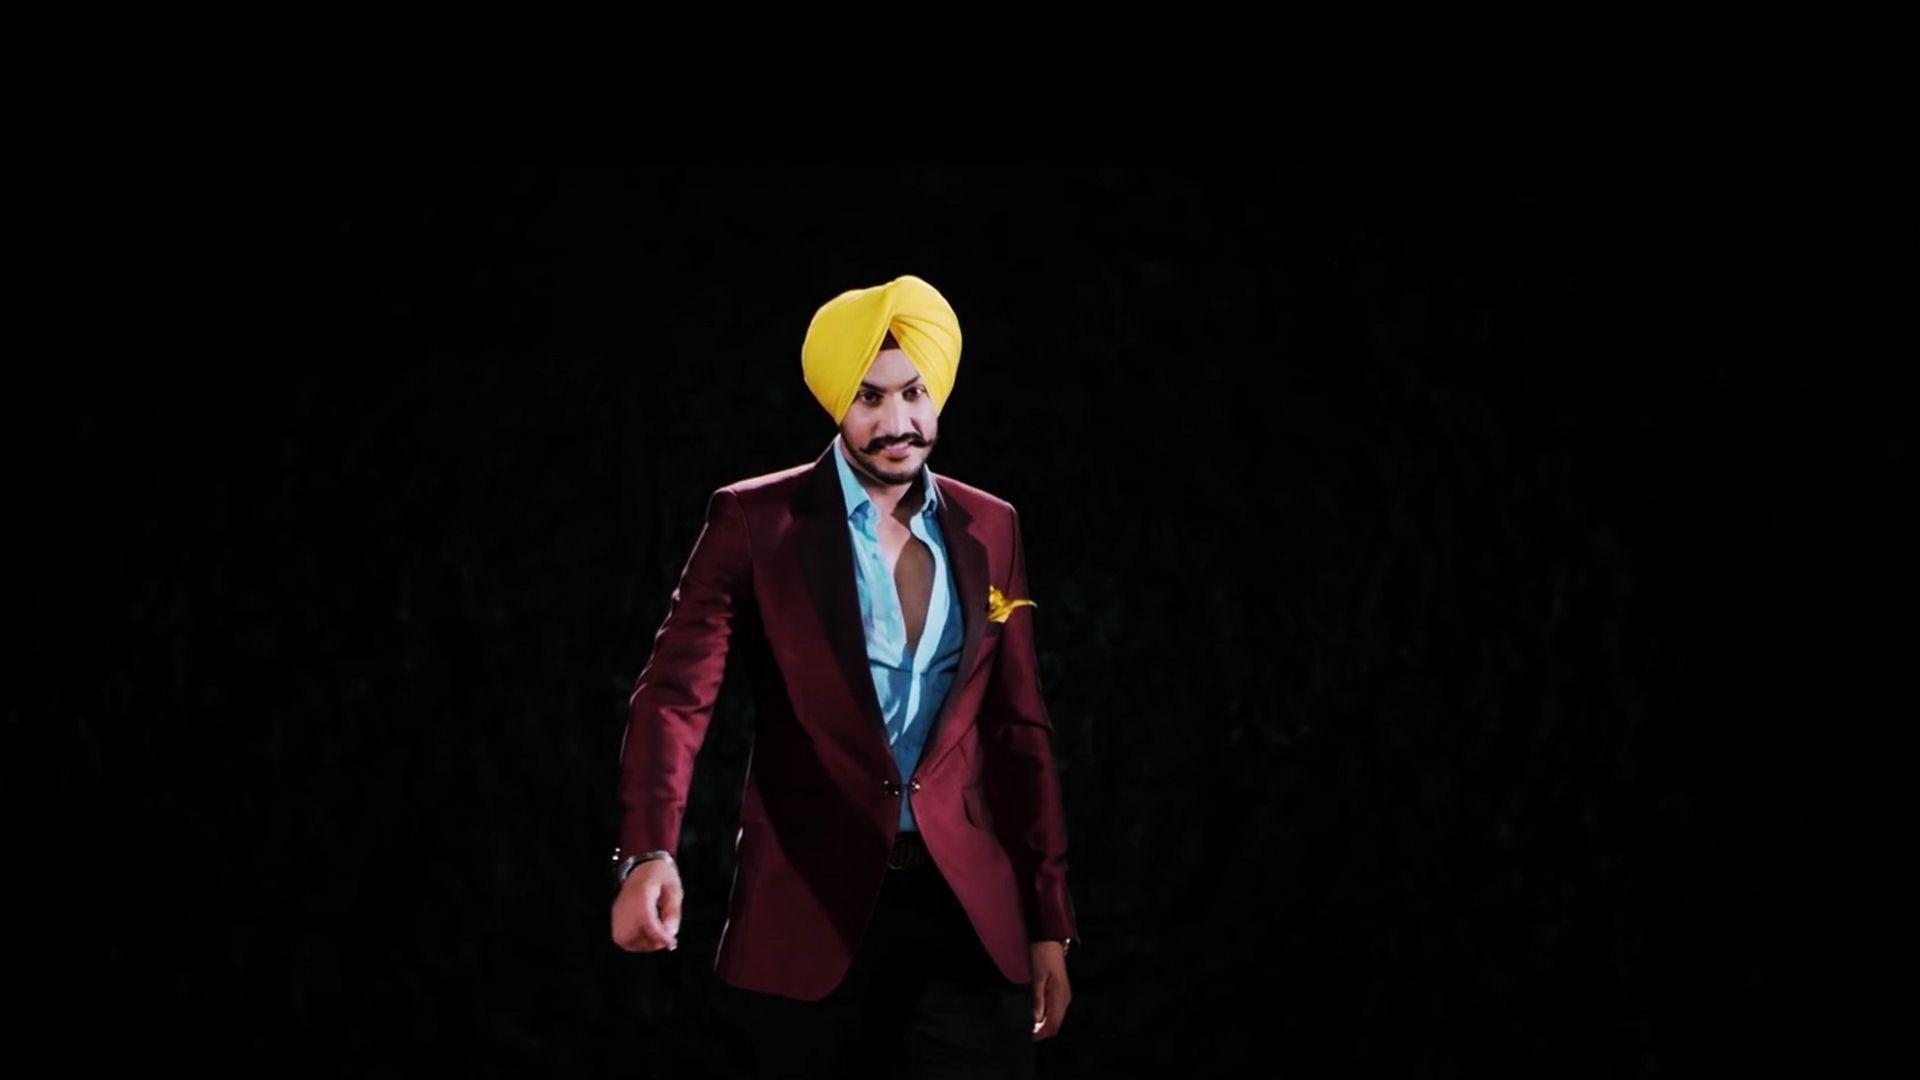 Rajvir Jawanda Yellow Turban Purple Suit Wallpaper 10342   Baltana 1920x1080